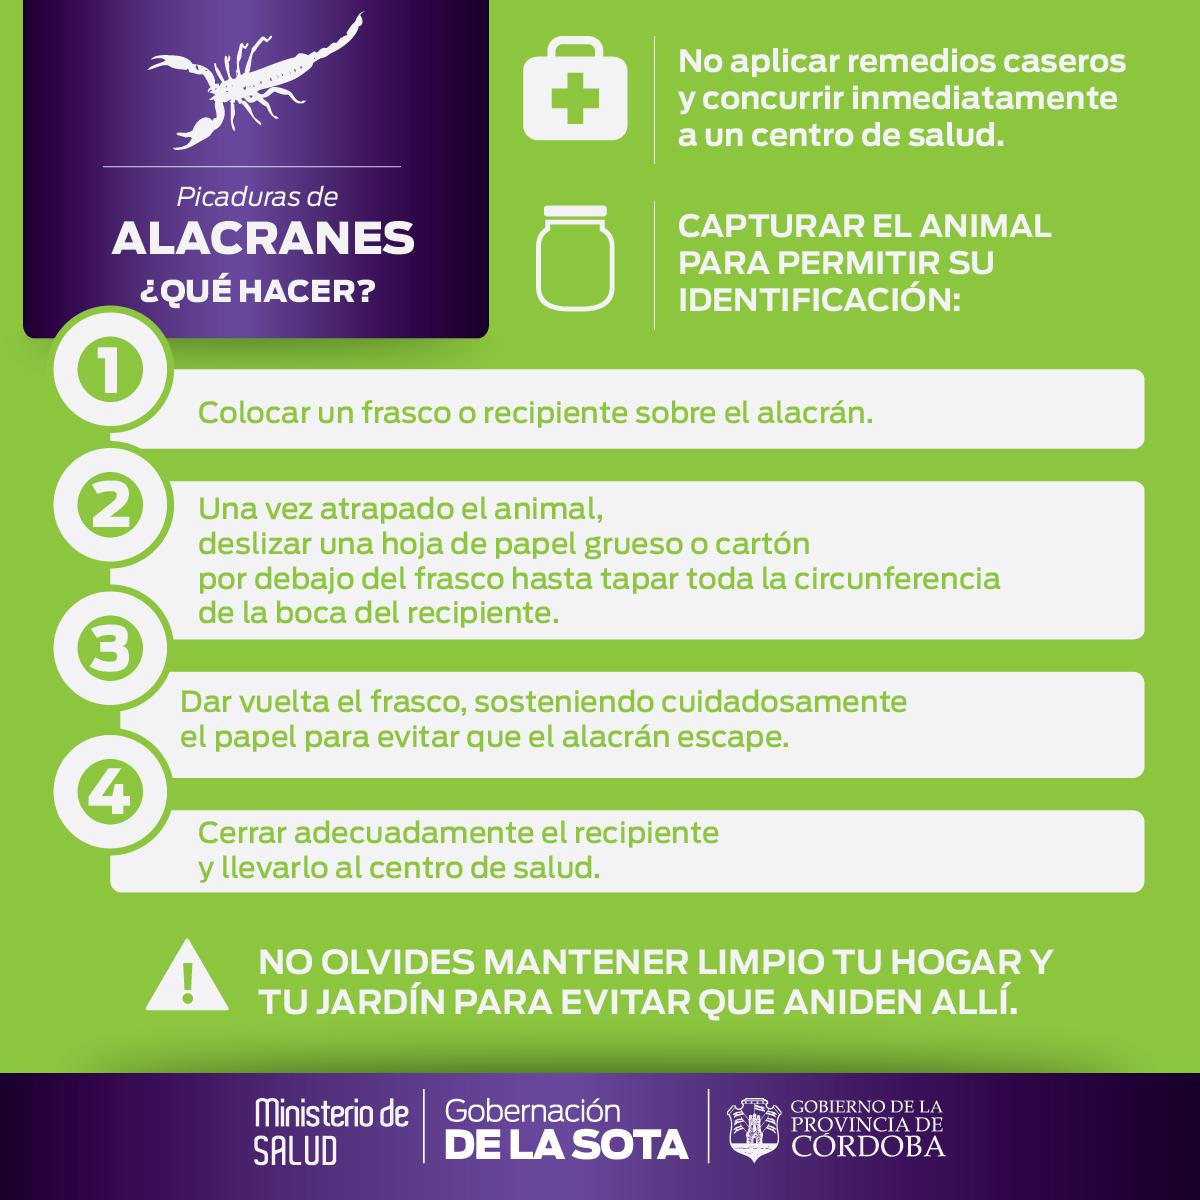 Alacranes2Nuevo-Gob Cba-30Dic-01